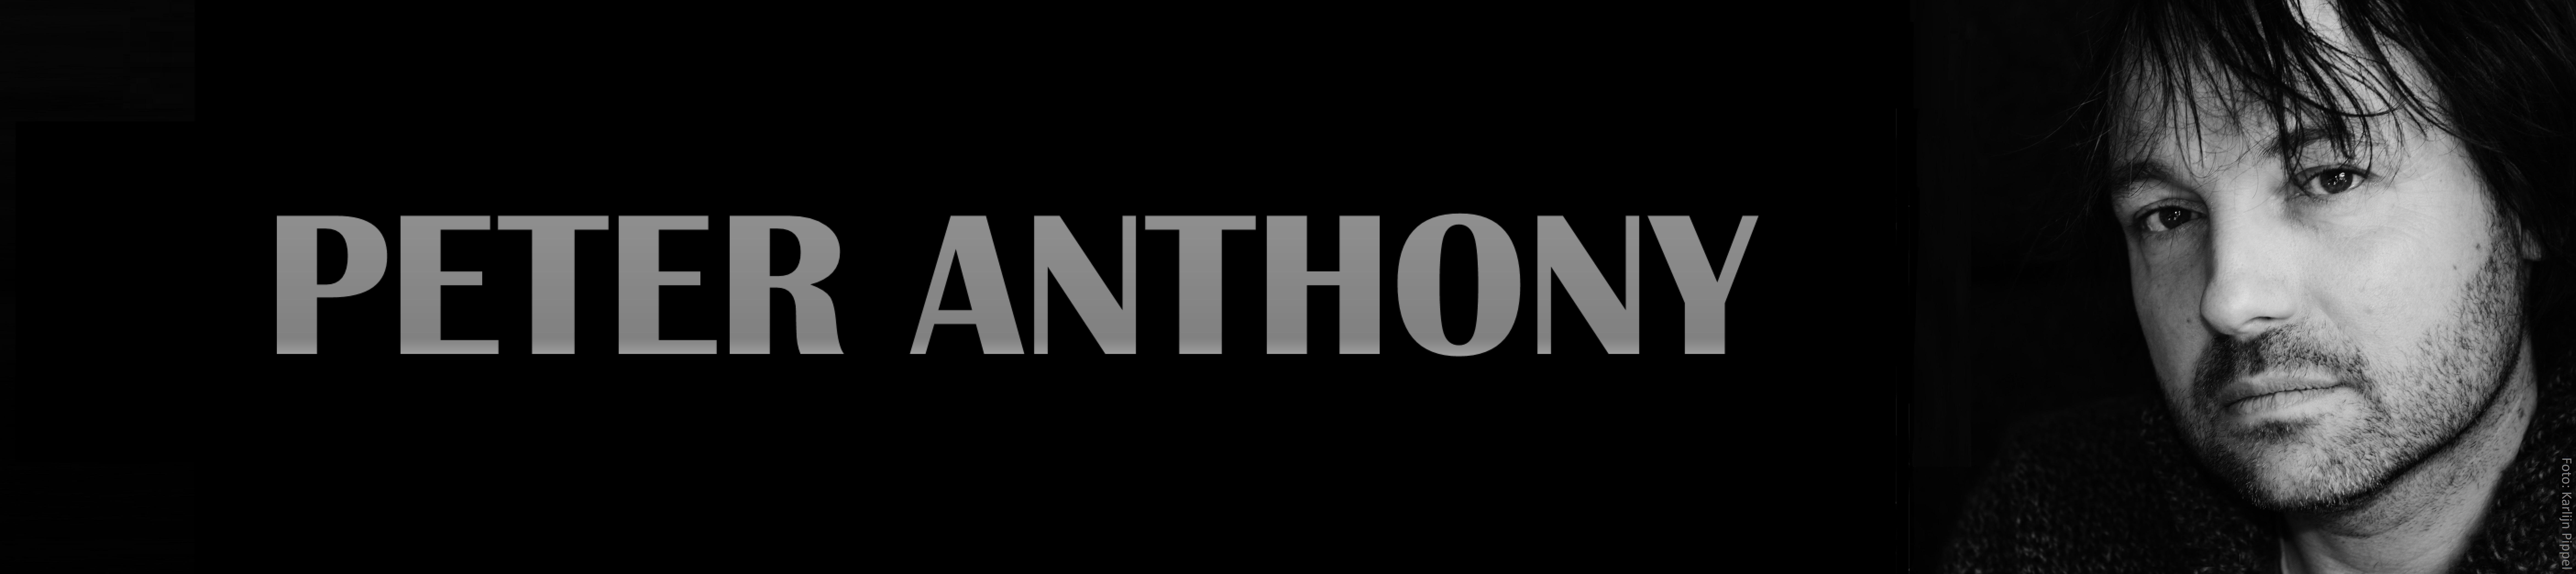 PeterAnthony.nl